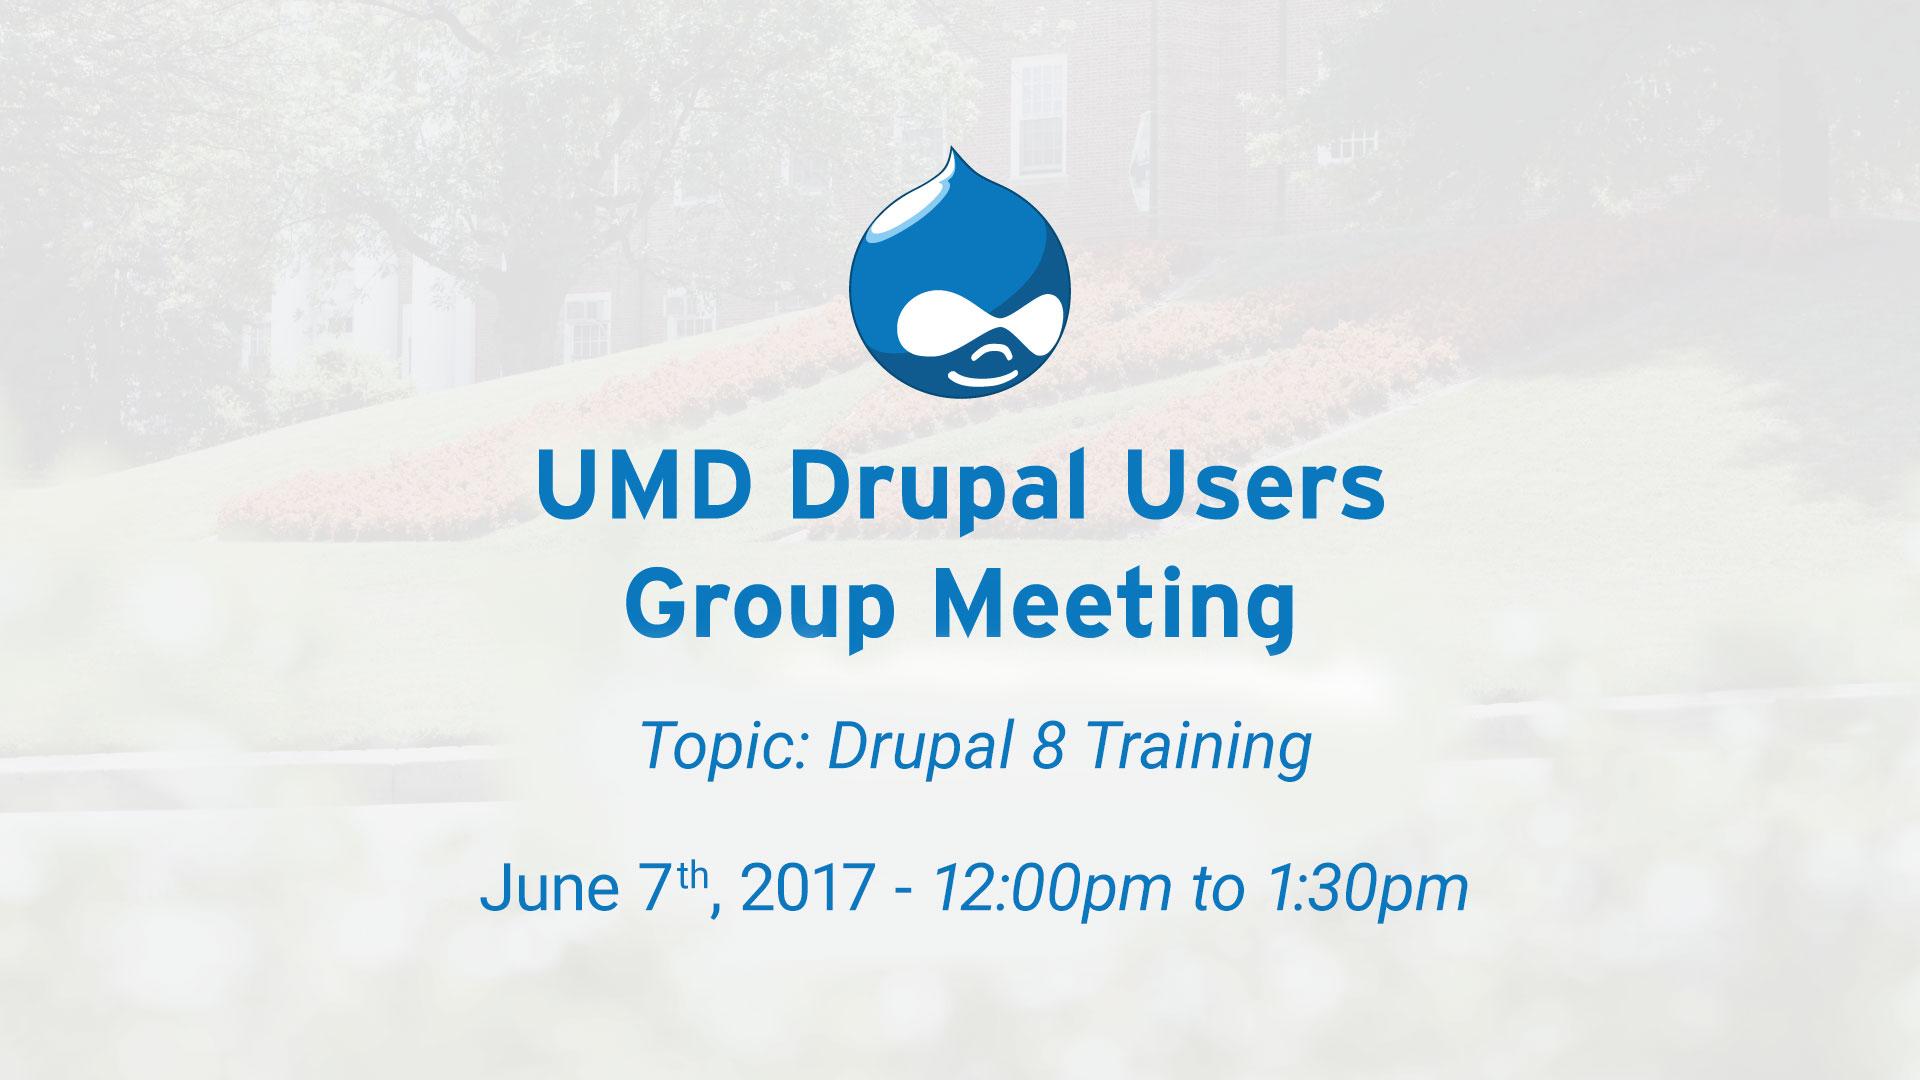 Drupal Users Meeting - Drupal 8 Training